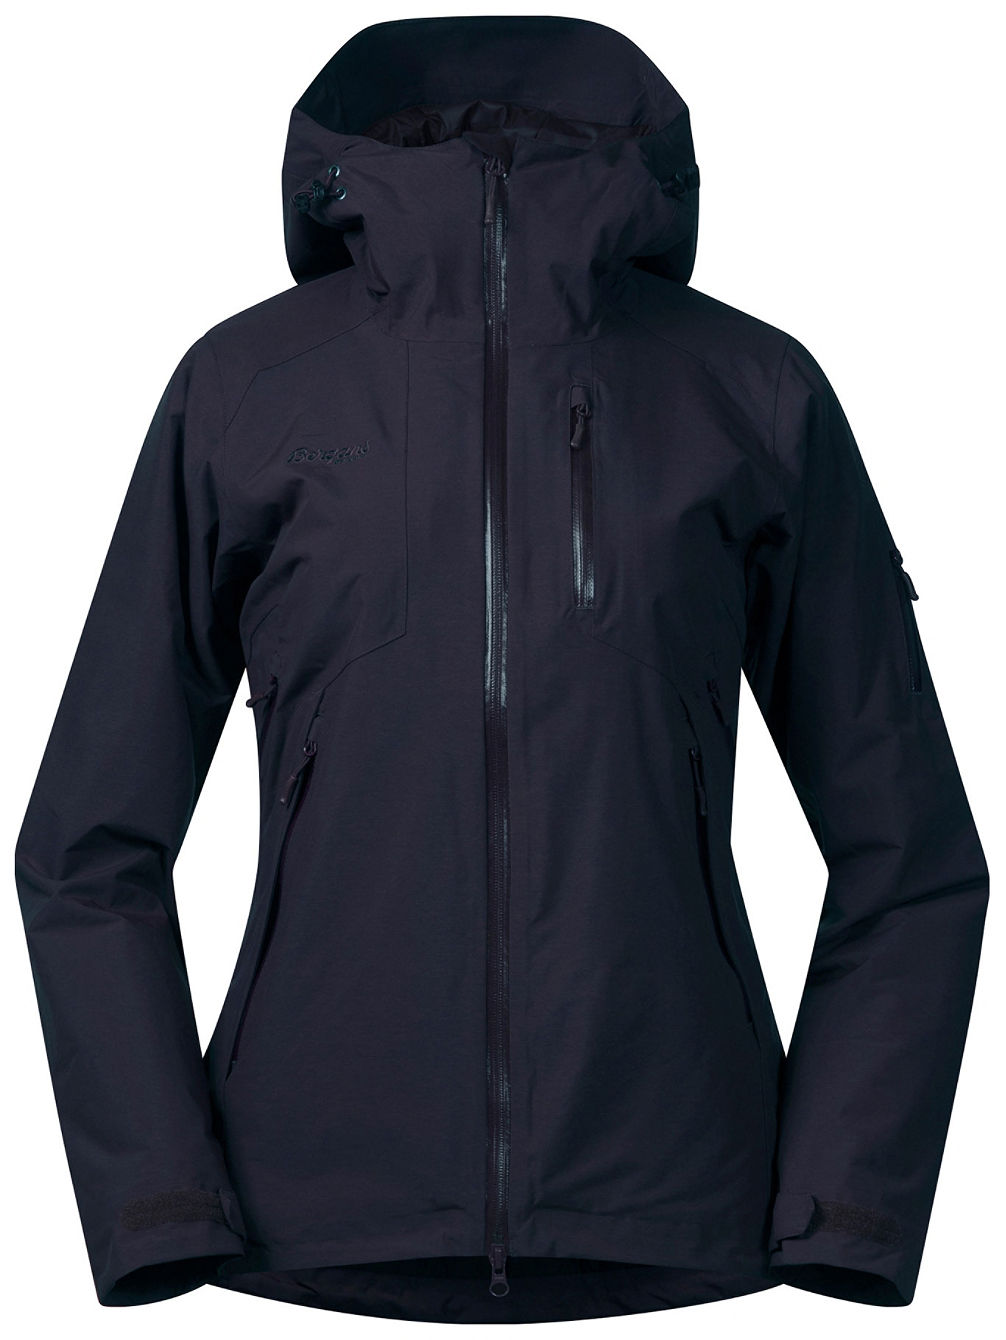 4209a9178 Haglebu Insulated Jacket